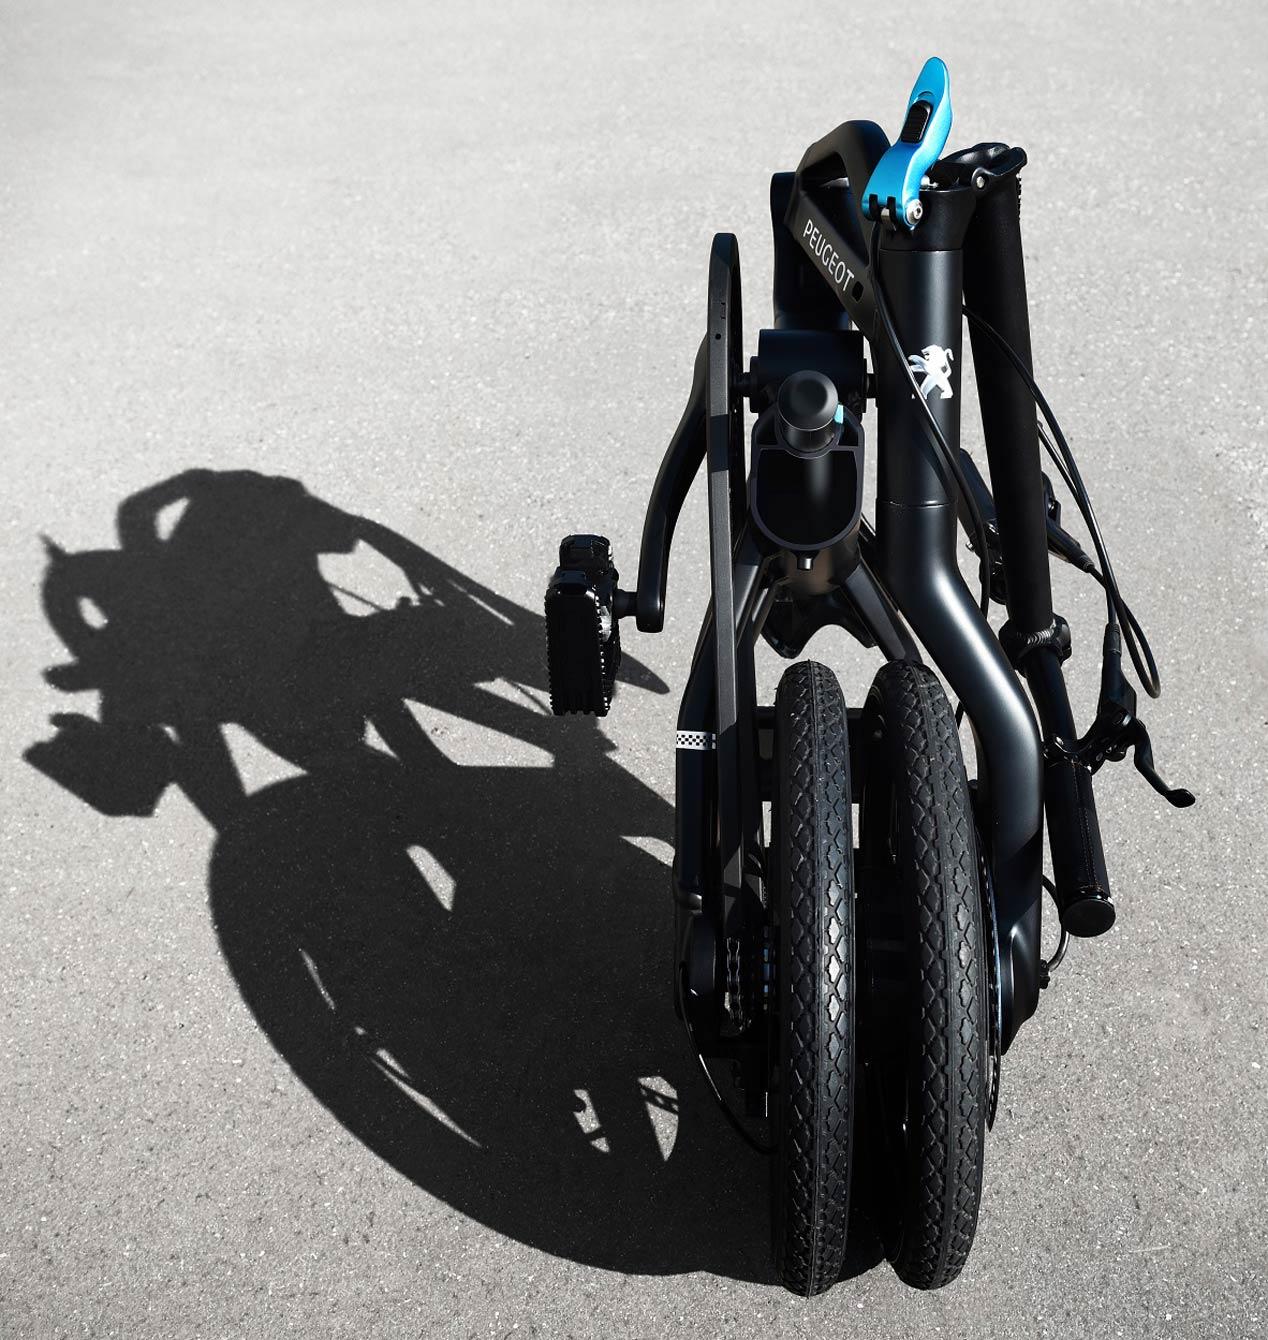 eF01, la nueva bicicleta eléctrica plegable de Peugeot